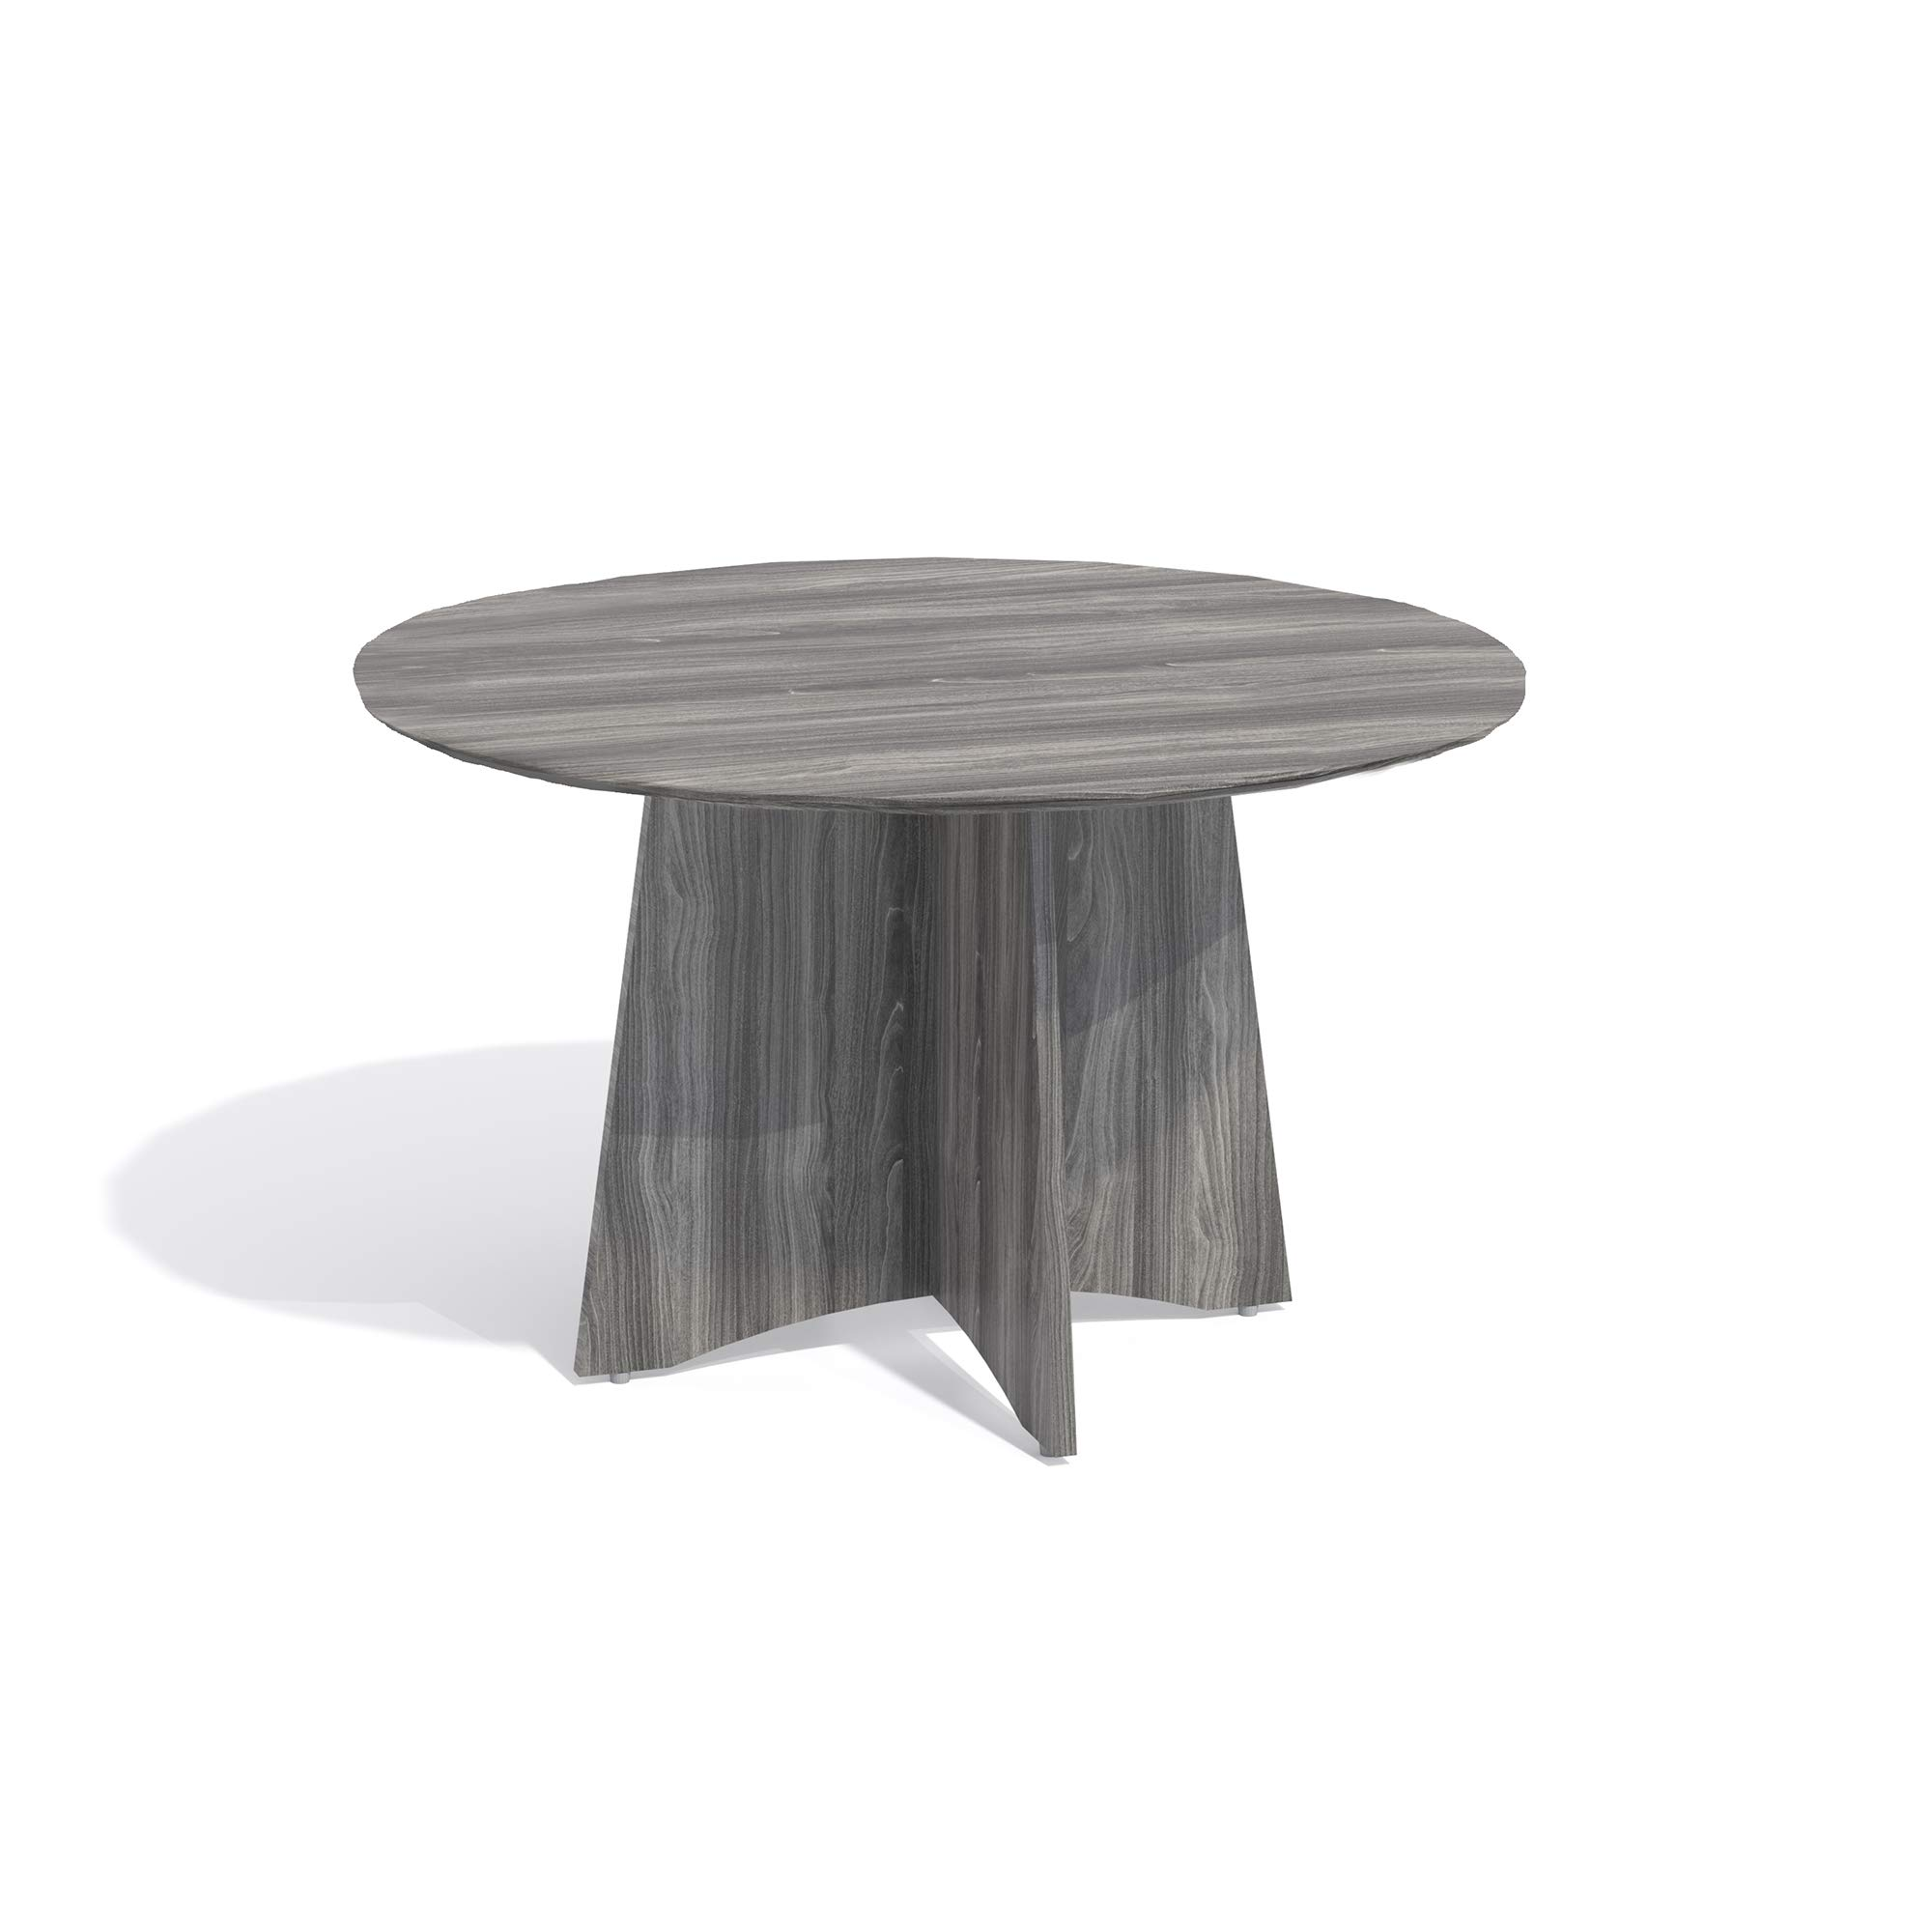 Mayline MNCR48LGS Medina 48''Dia. Round Conference Table, Gray Steel Laminate